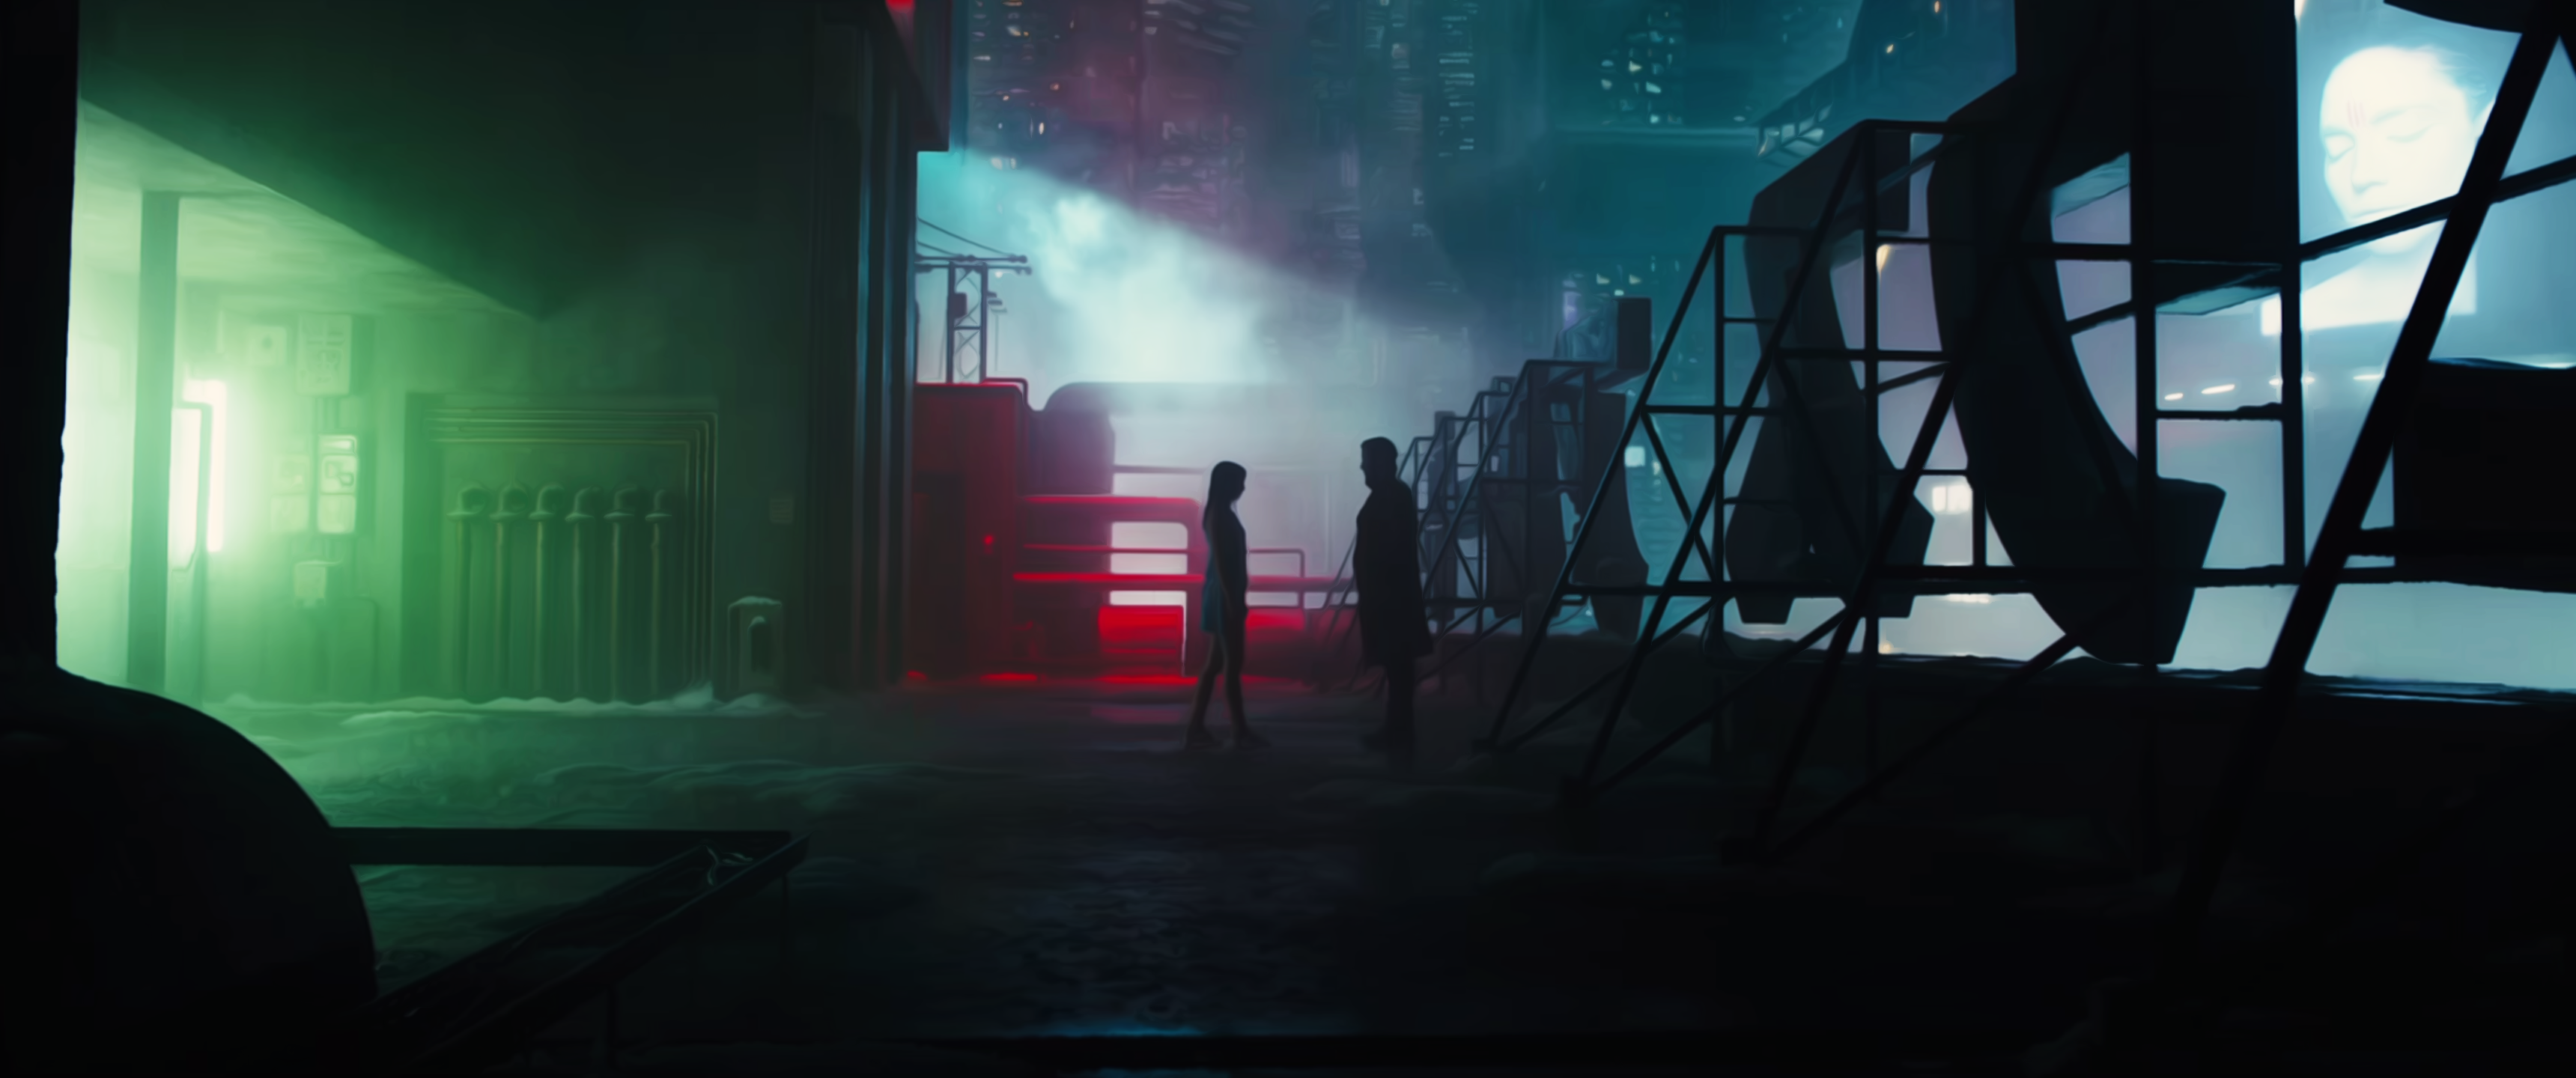 Blade Runner 2049 [3440x1440] Paisagem fantasia